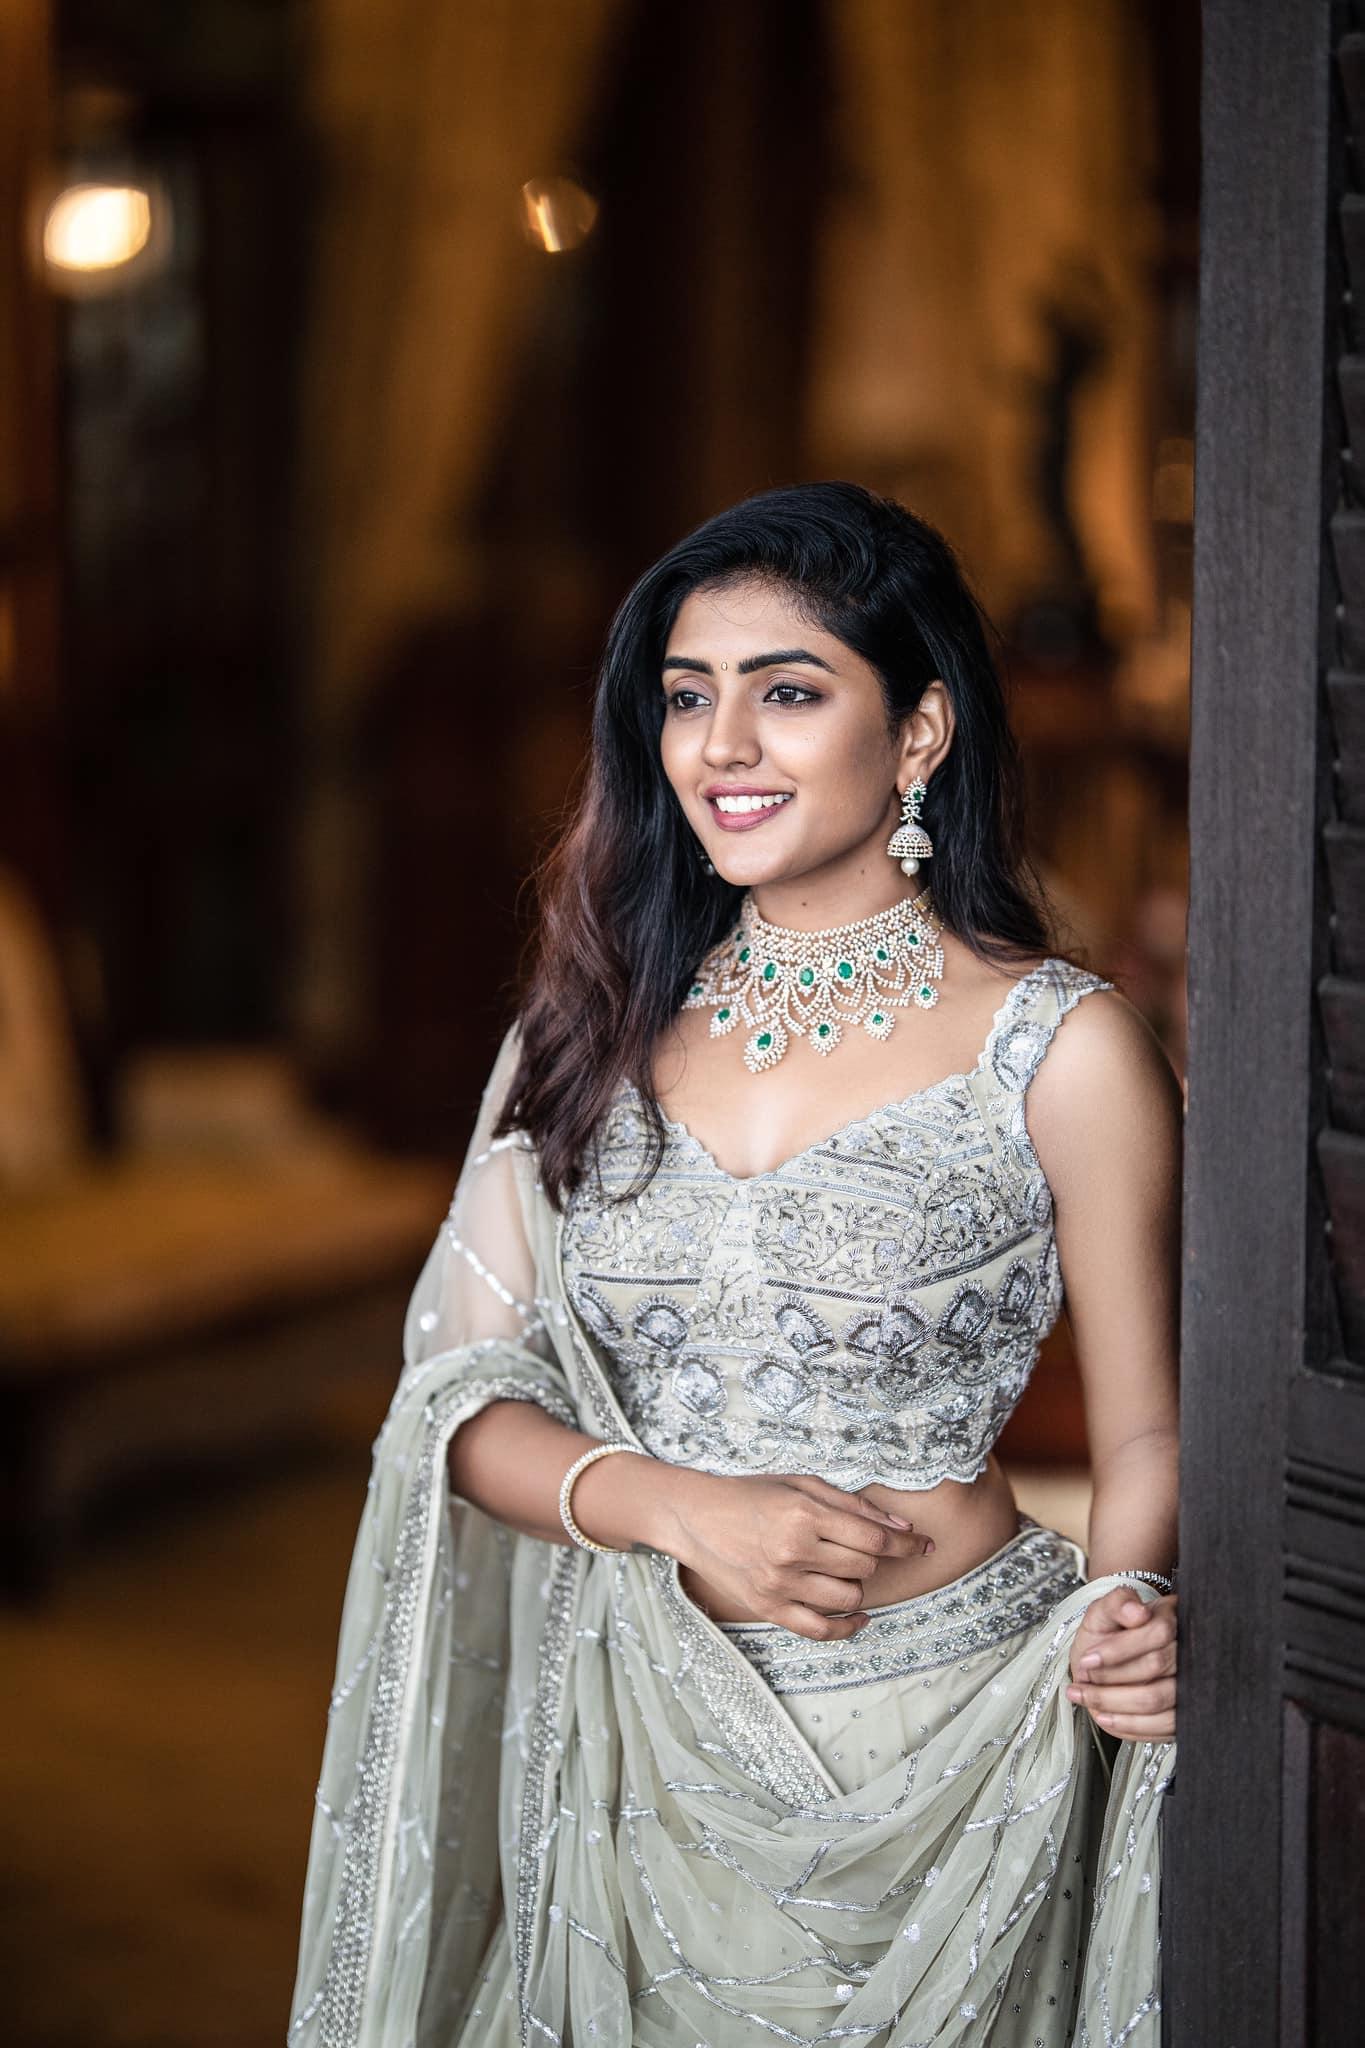 Beautiful actress Eesha Rebba in Sashi Vangapalli silver bridal lehenga set. 2021-09-06